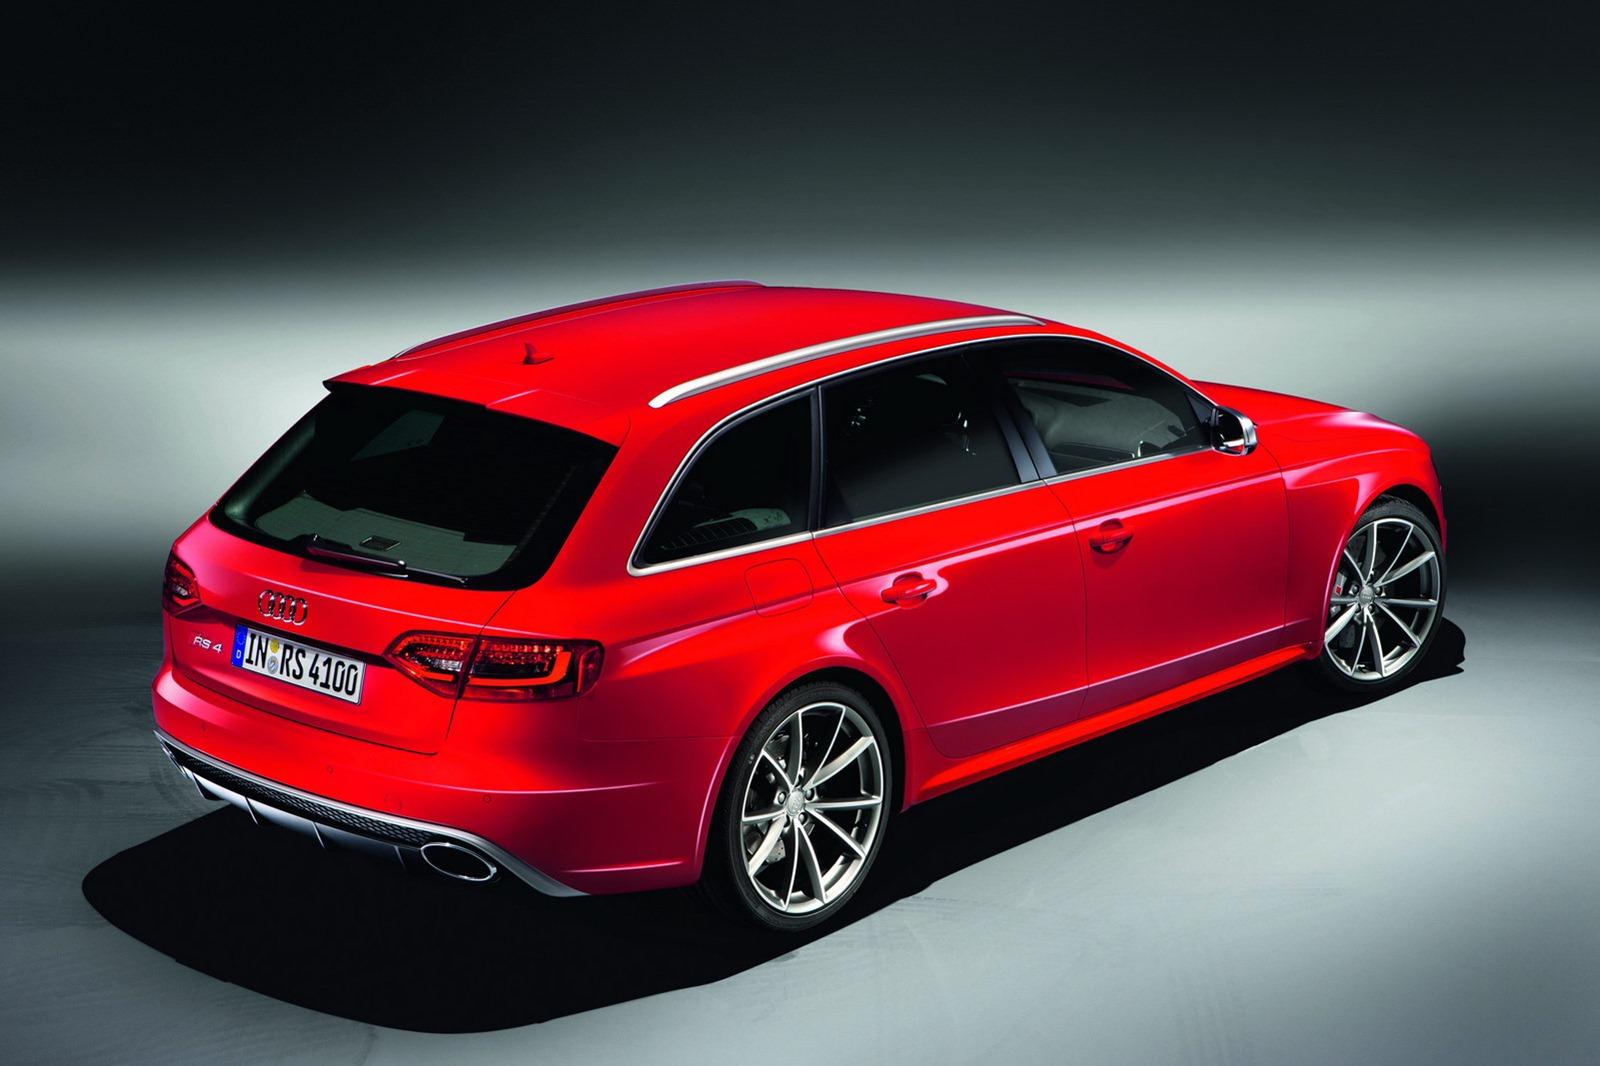 Ford V10 Specs >> 2012 Audi RS4 Avant Specs and Photos - autoevolution